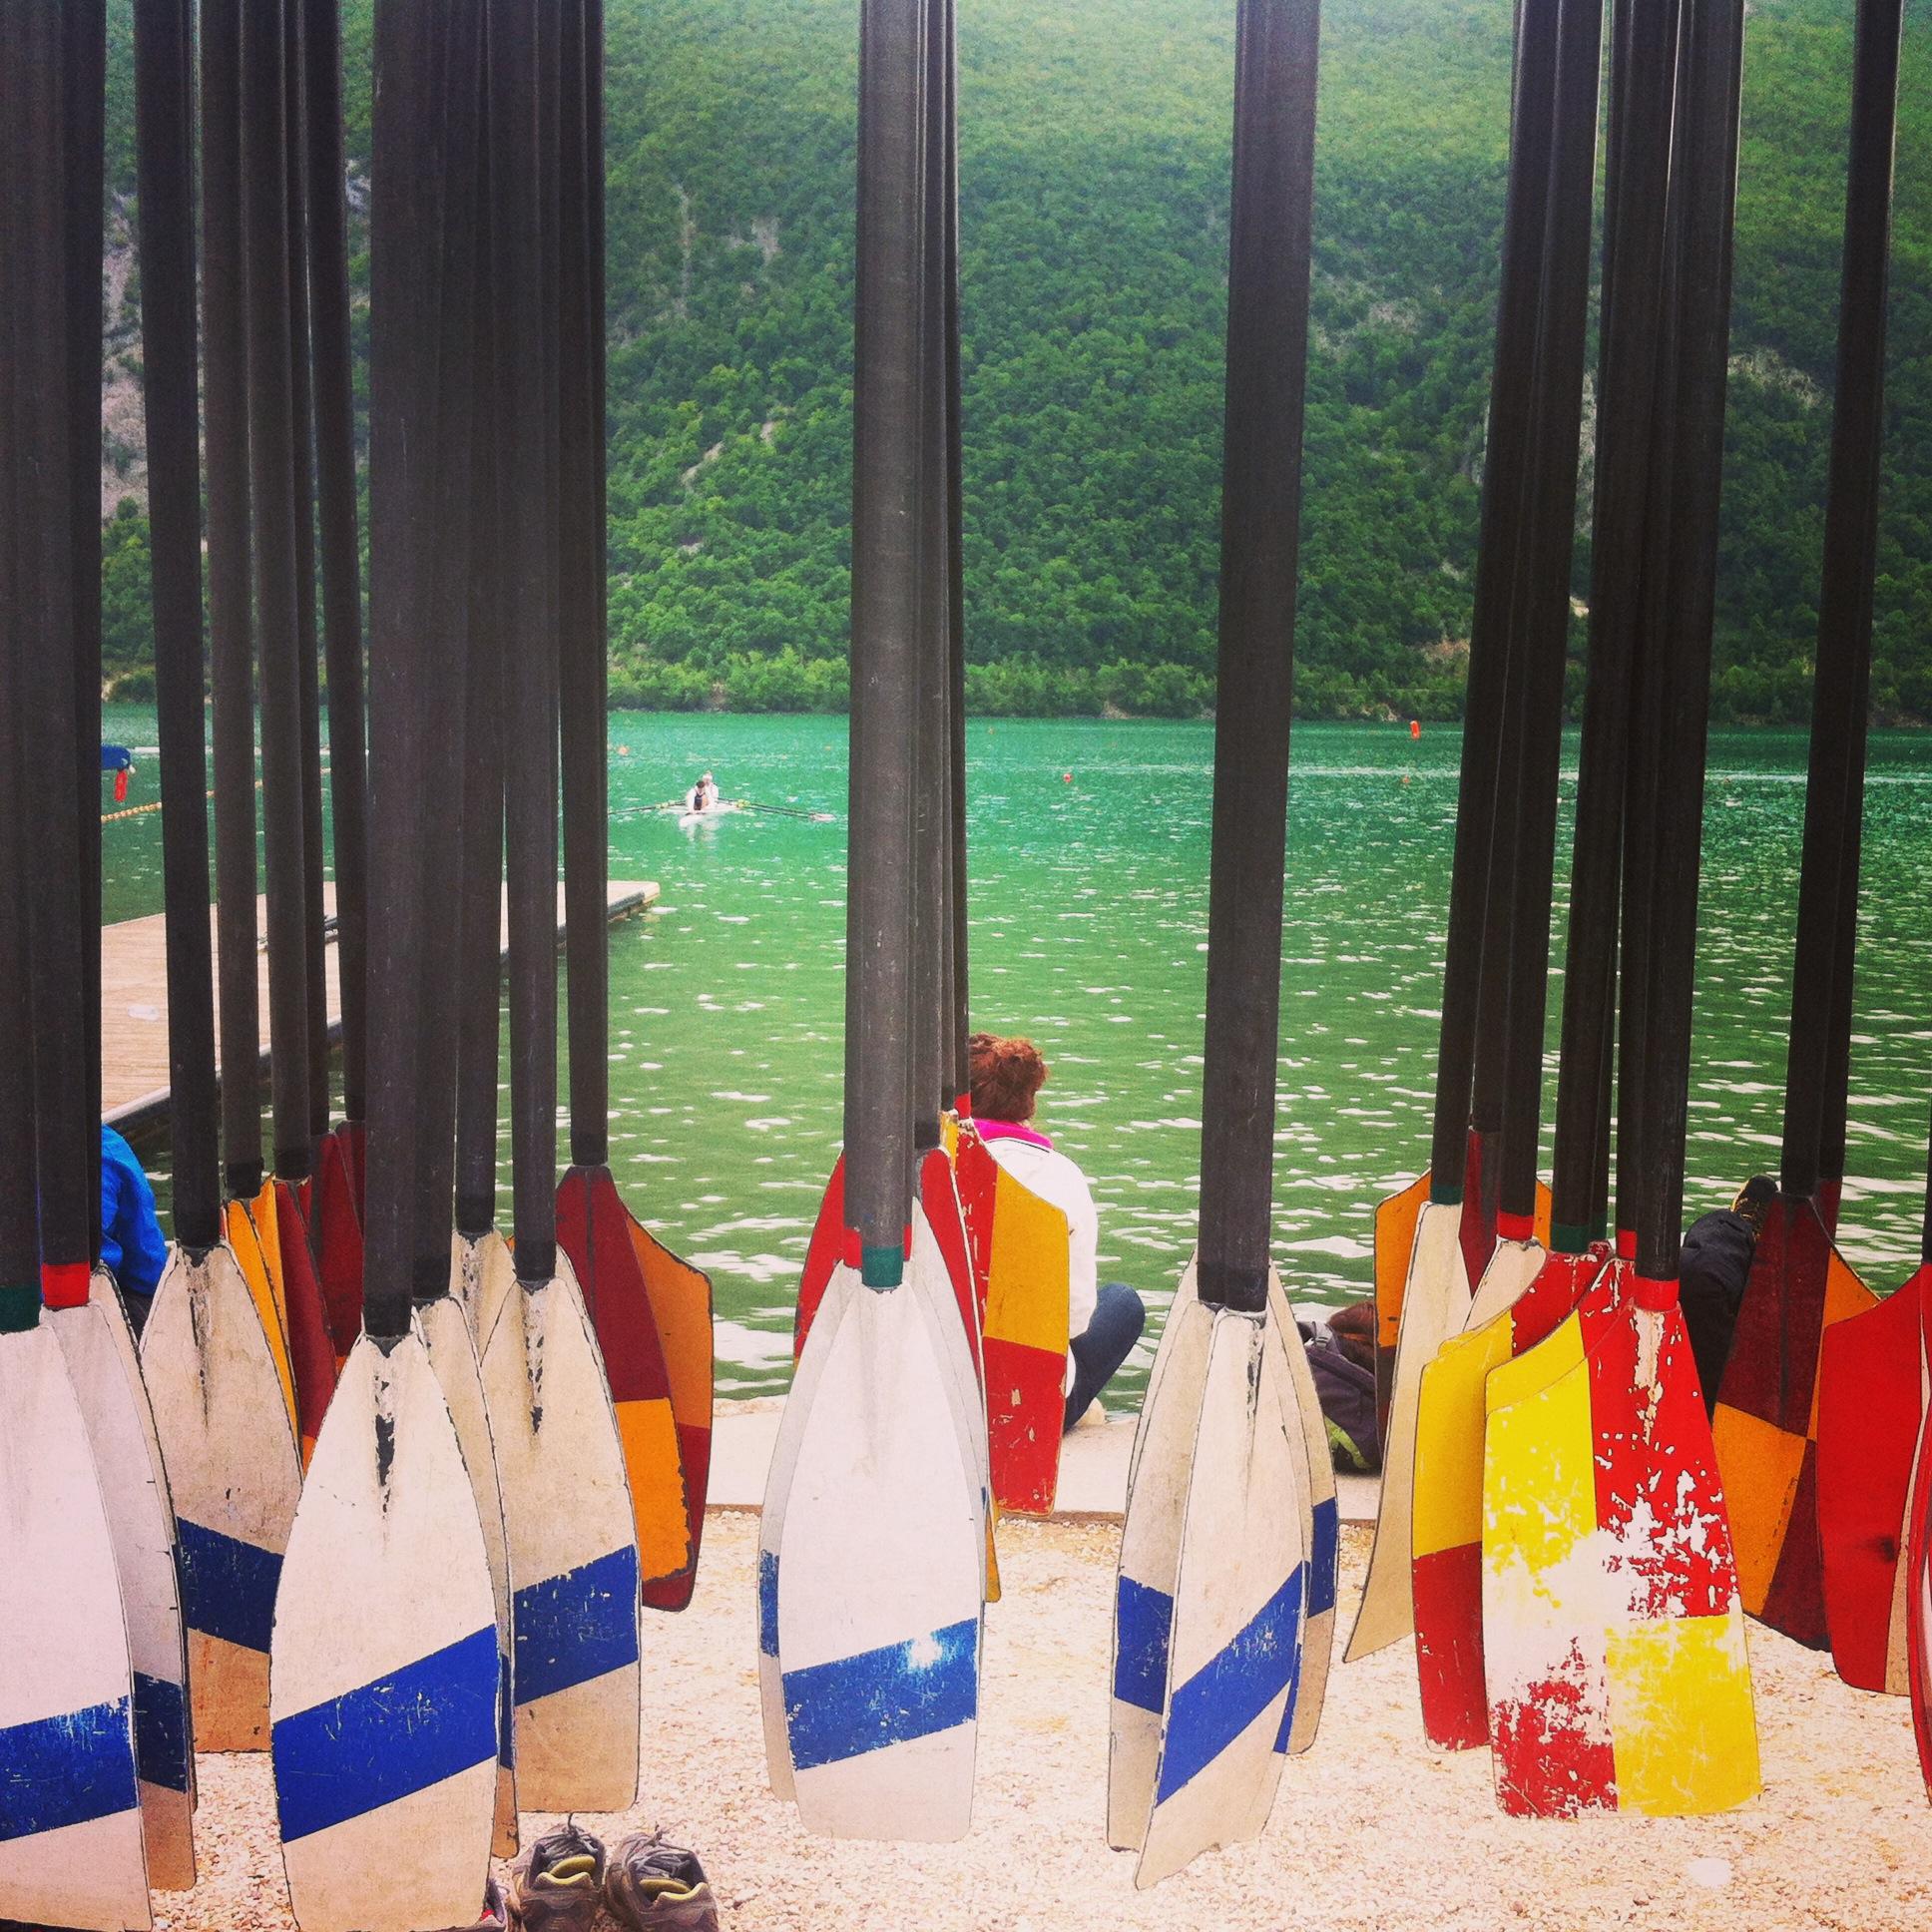 Les mondiaux d'aviron